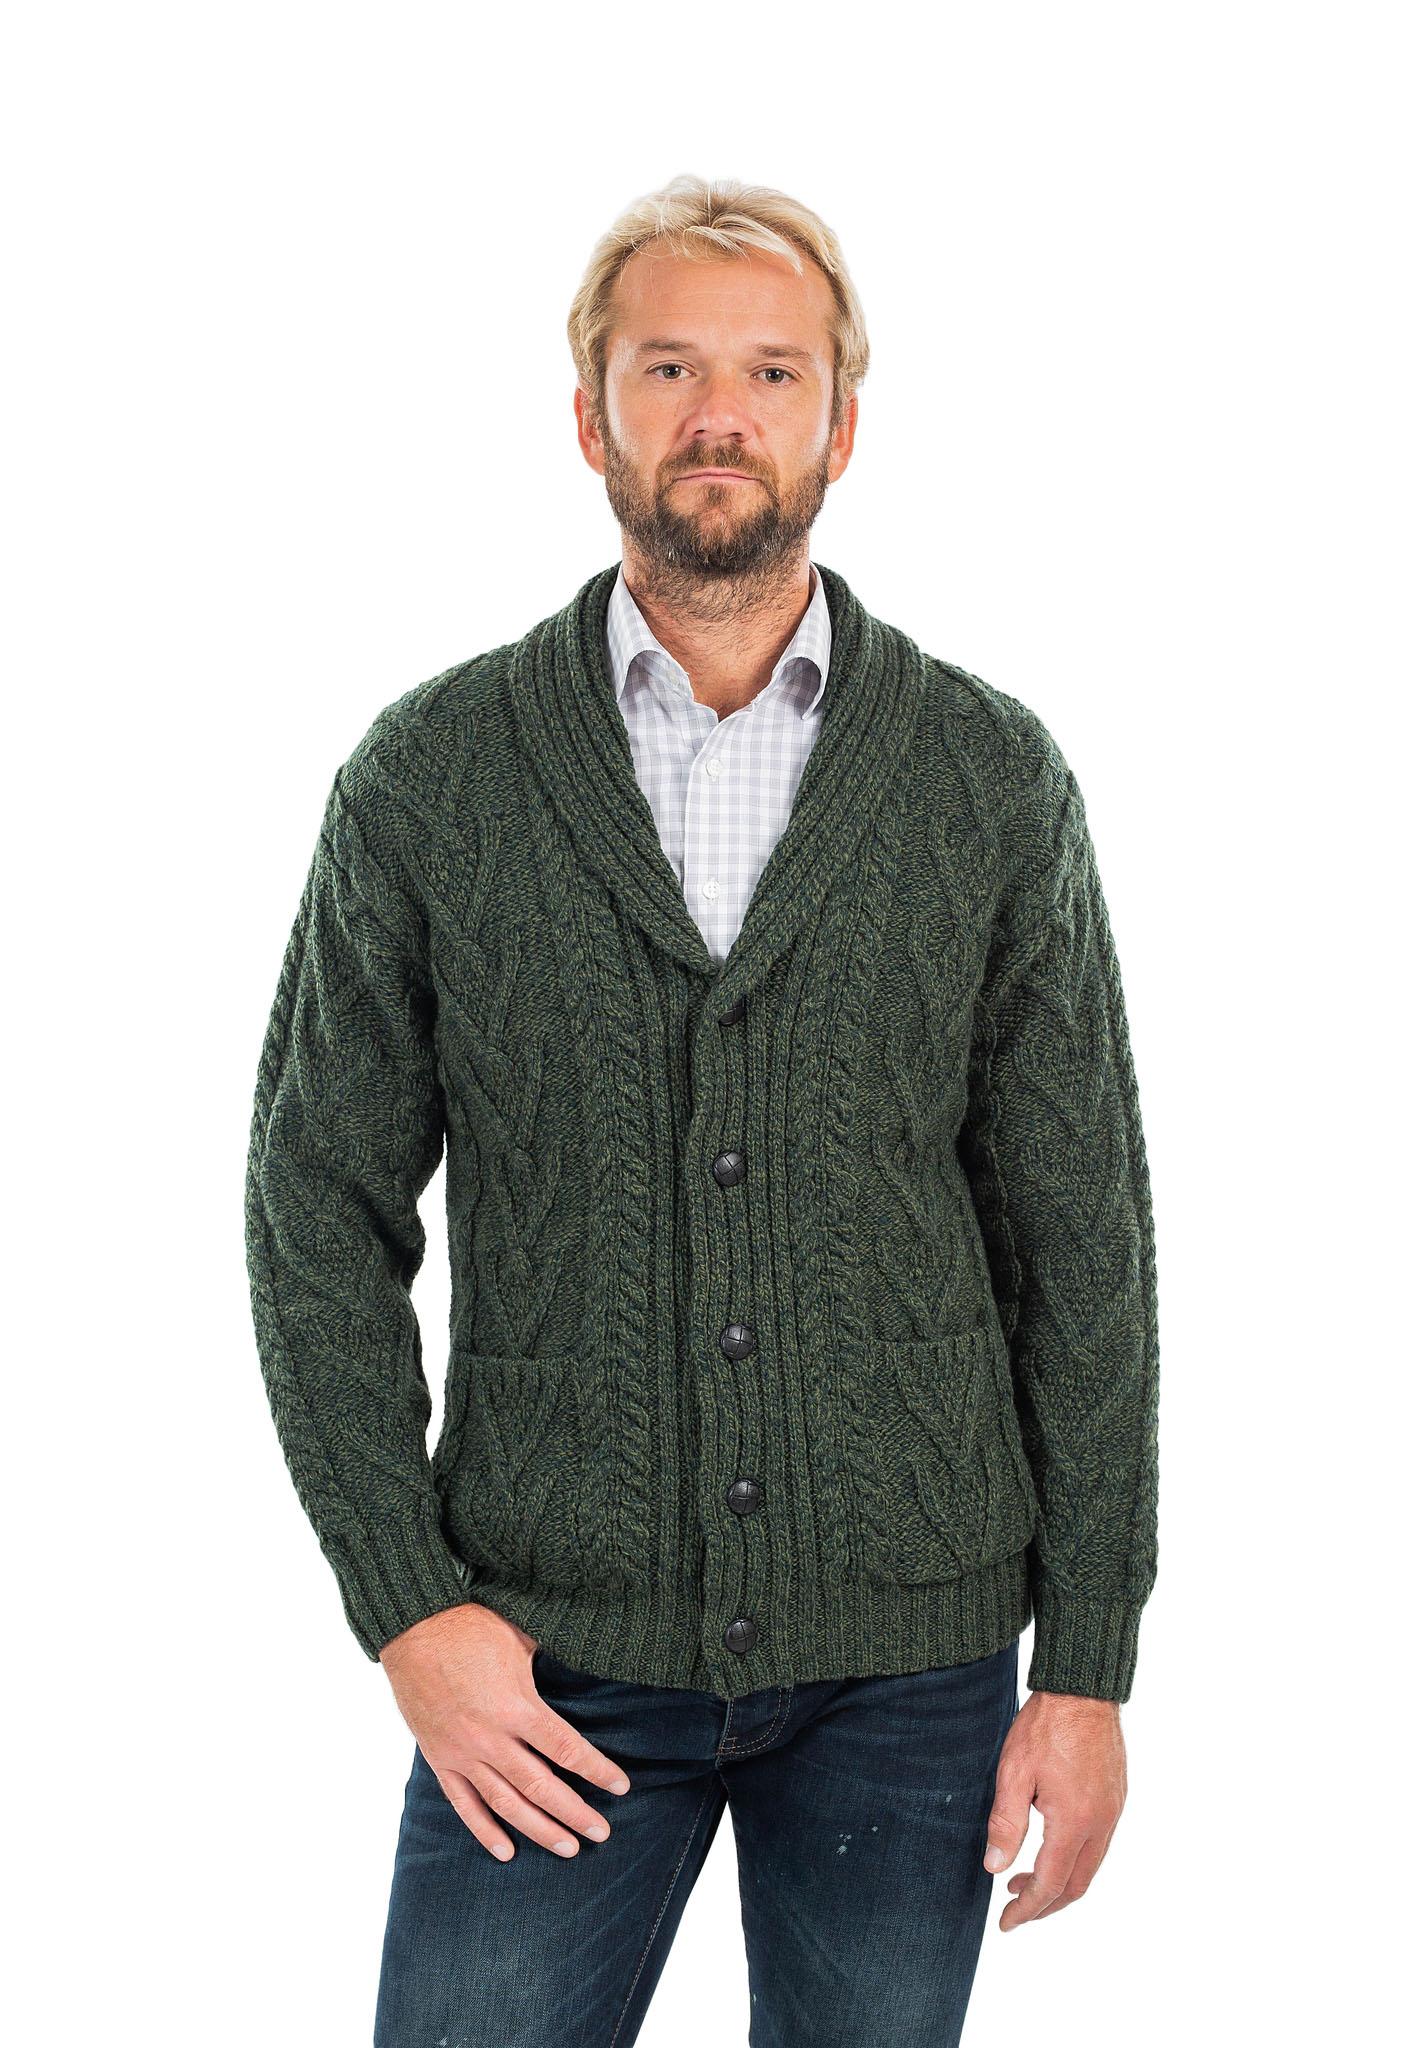 SAOL-Mens-Irish-Merino-Wool-Cardigan-Shawl-Collar-Front-Pockets-Aran-Cable-Knit thumbnail 10